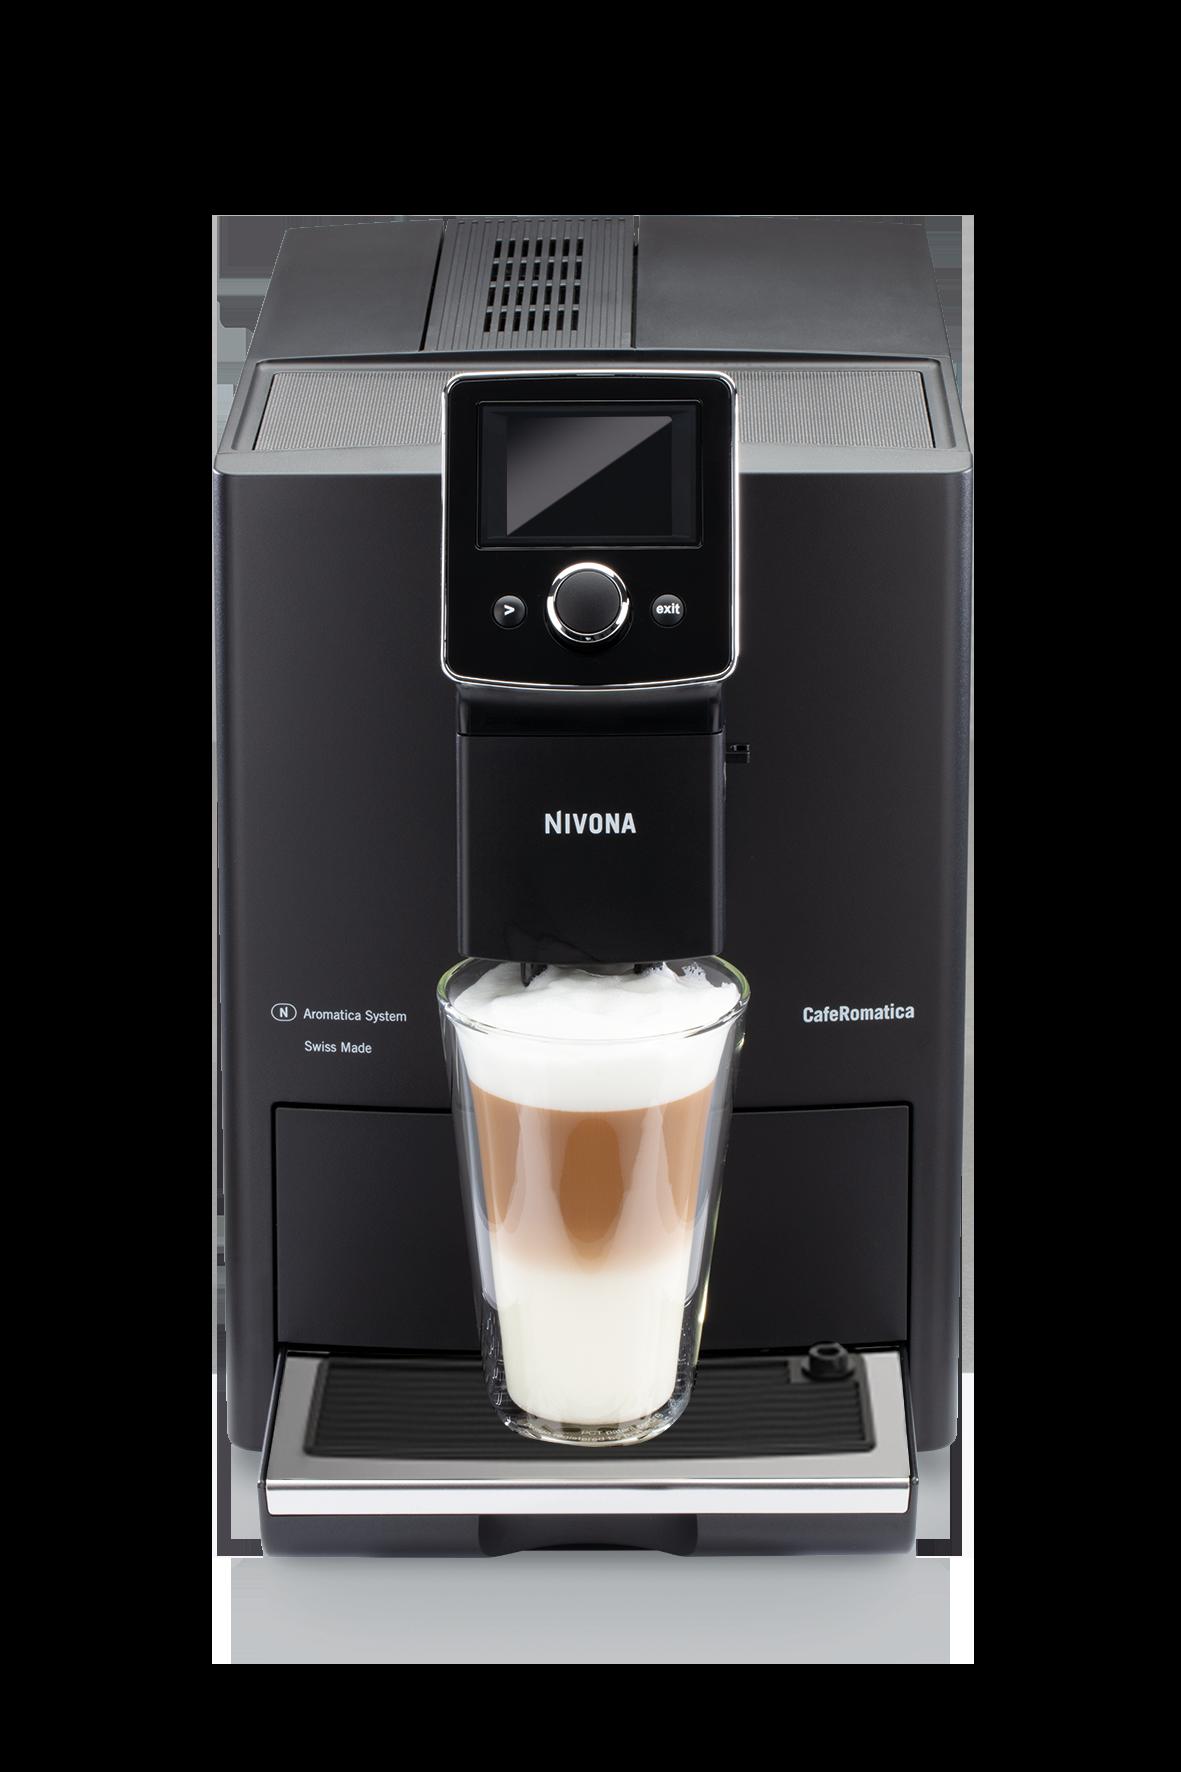 Nivona CafeRomatica 820 Mattschwarz - Chrom NICR820